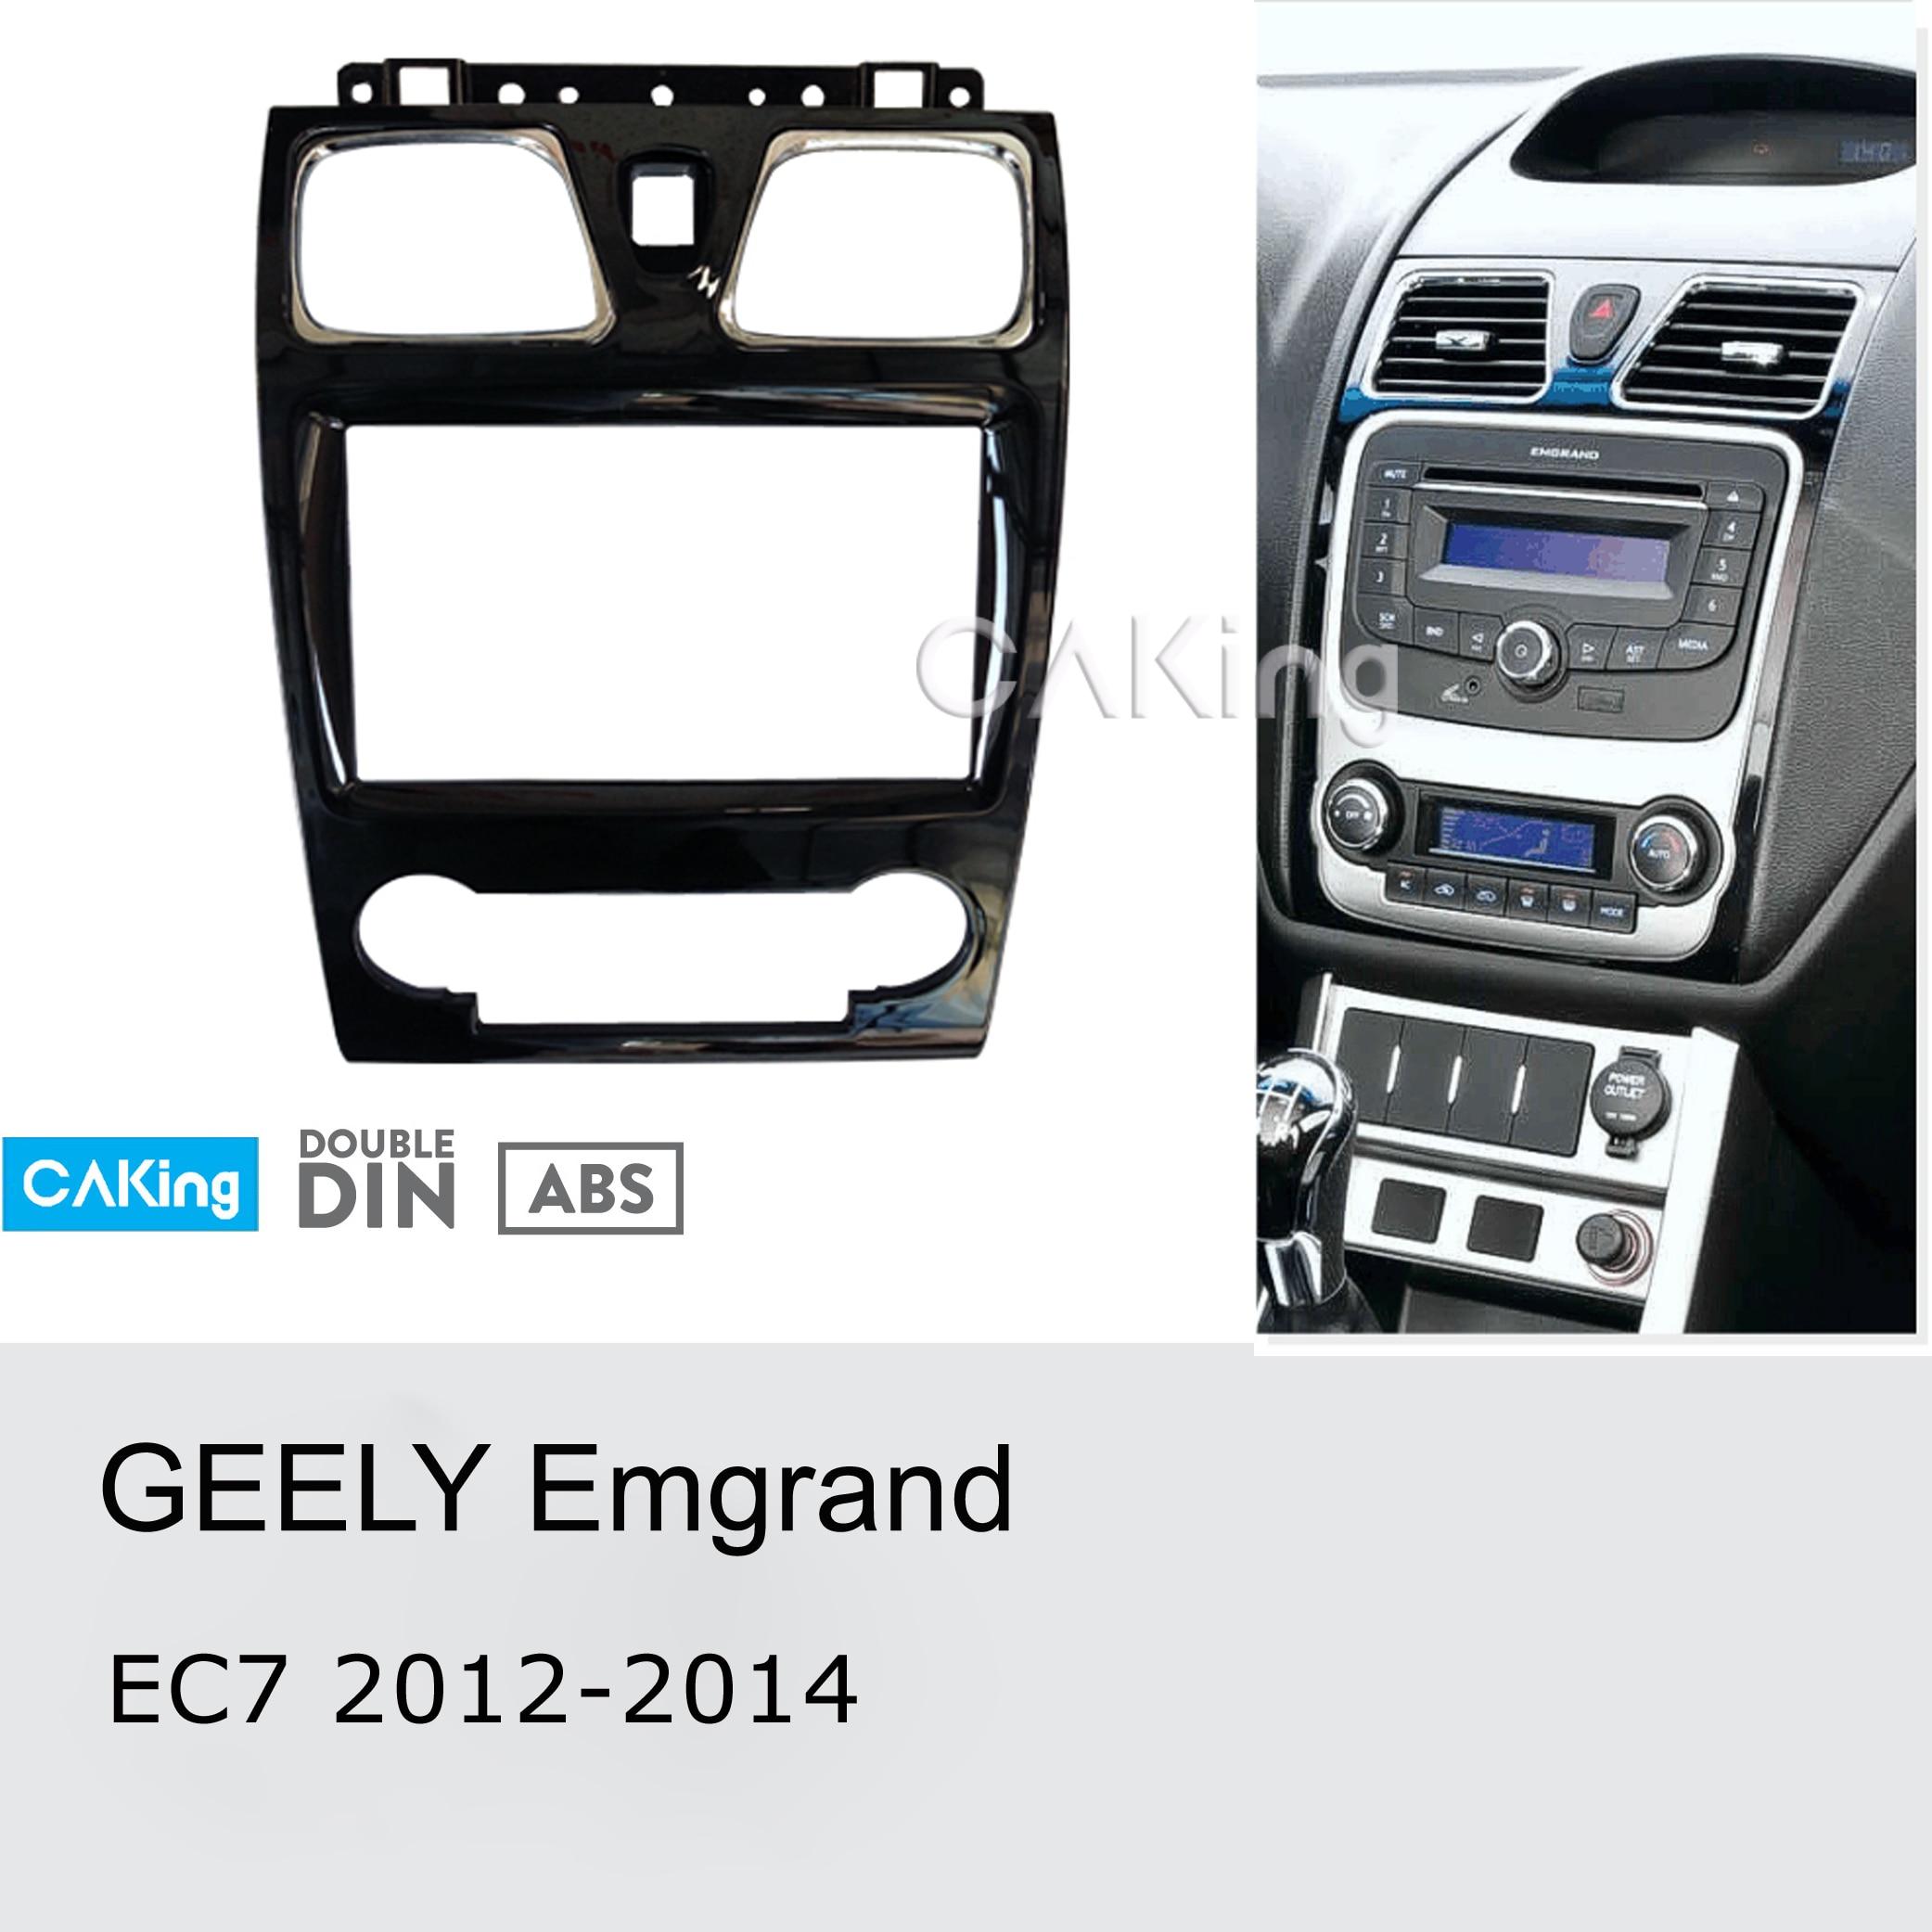 Double Din Fascia Radio Panel for GEELY Emgrand EC7 2012 2014 Frame Dash Fitting Kit Facia